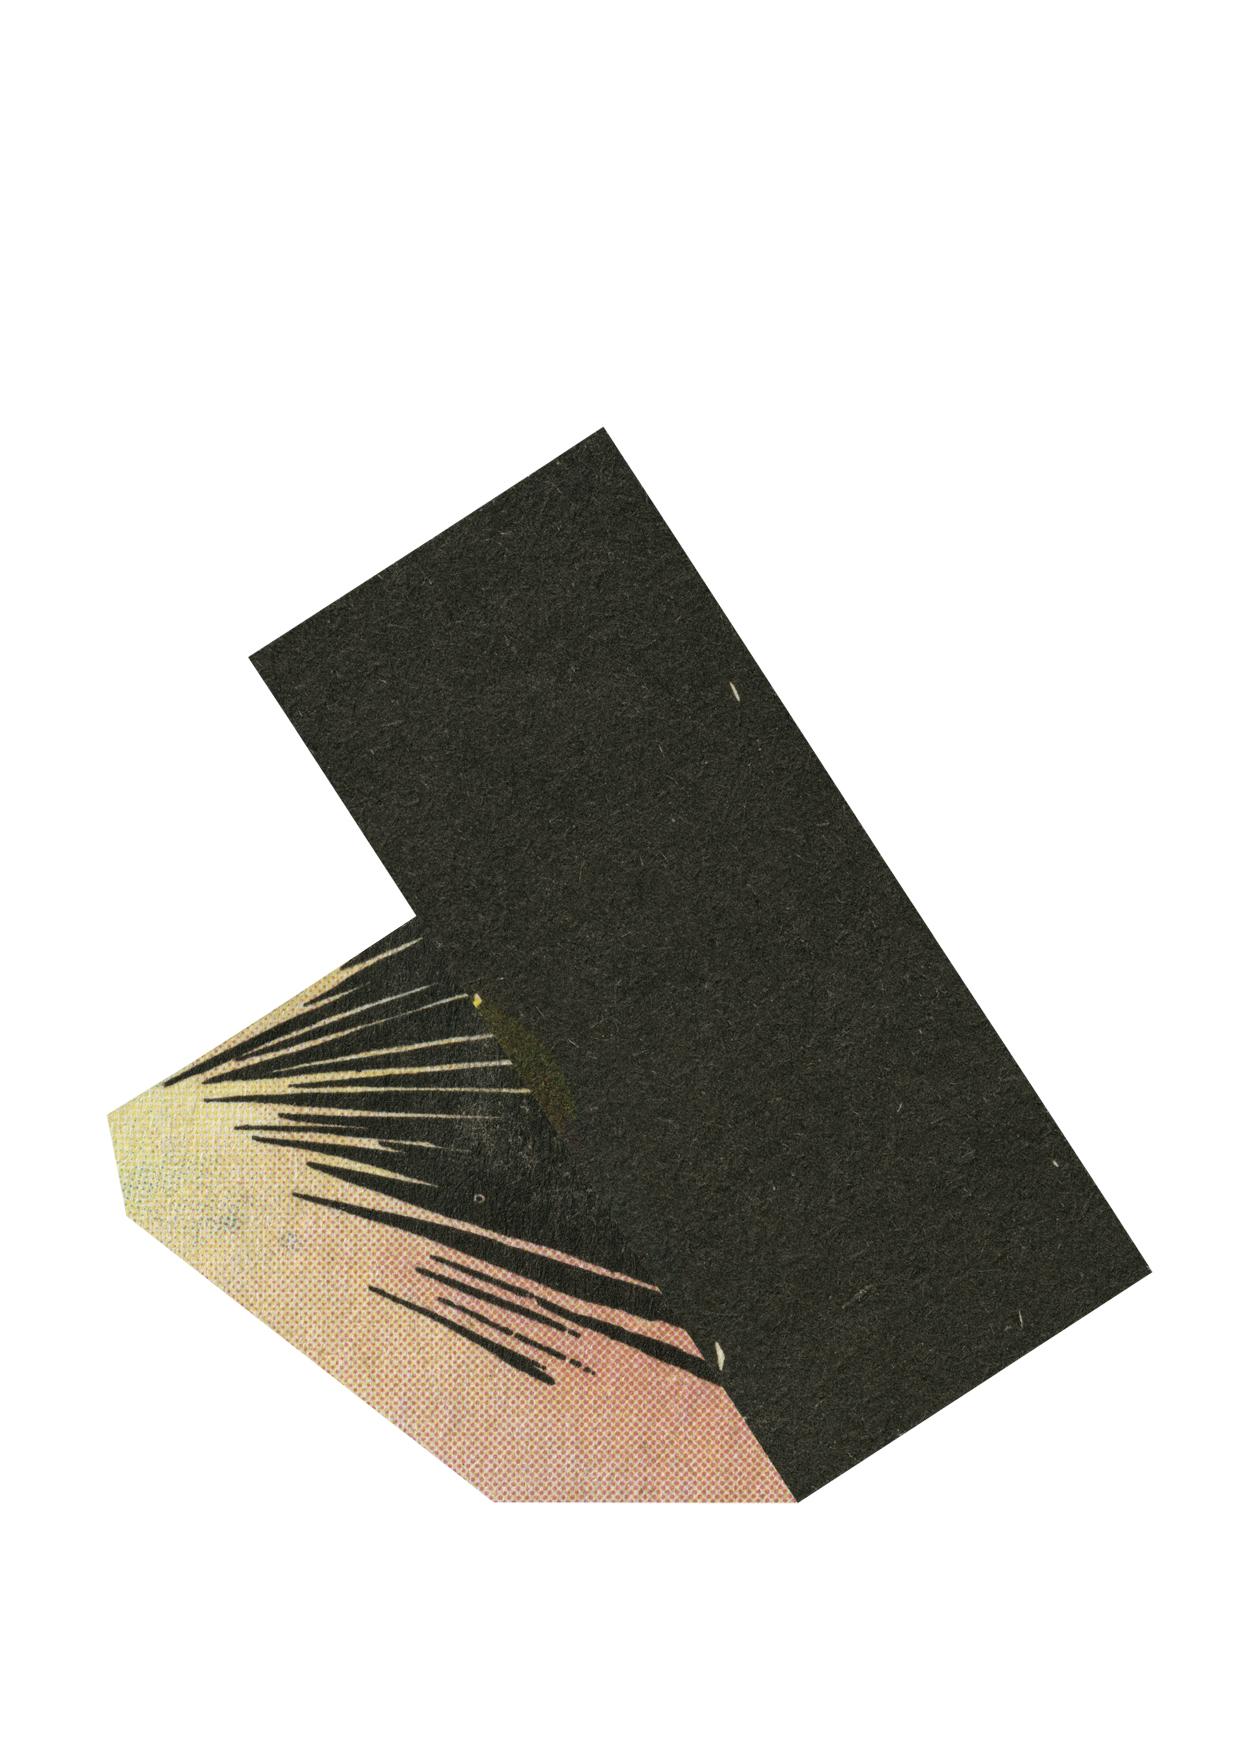 Slippages #5, 2015